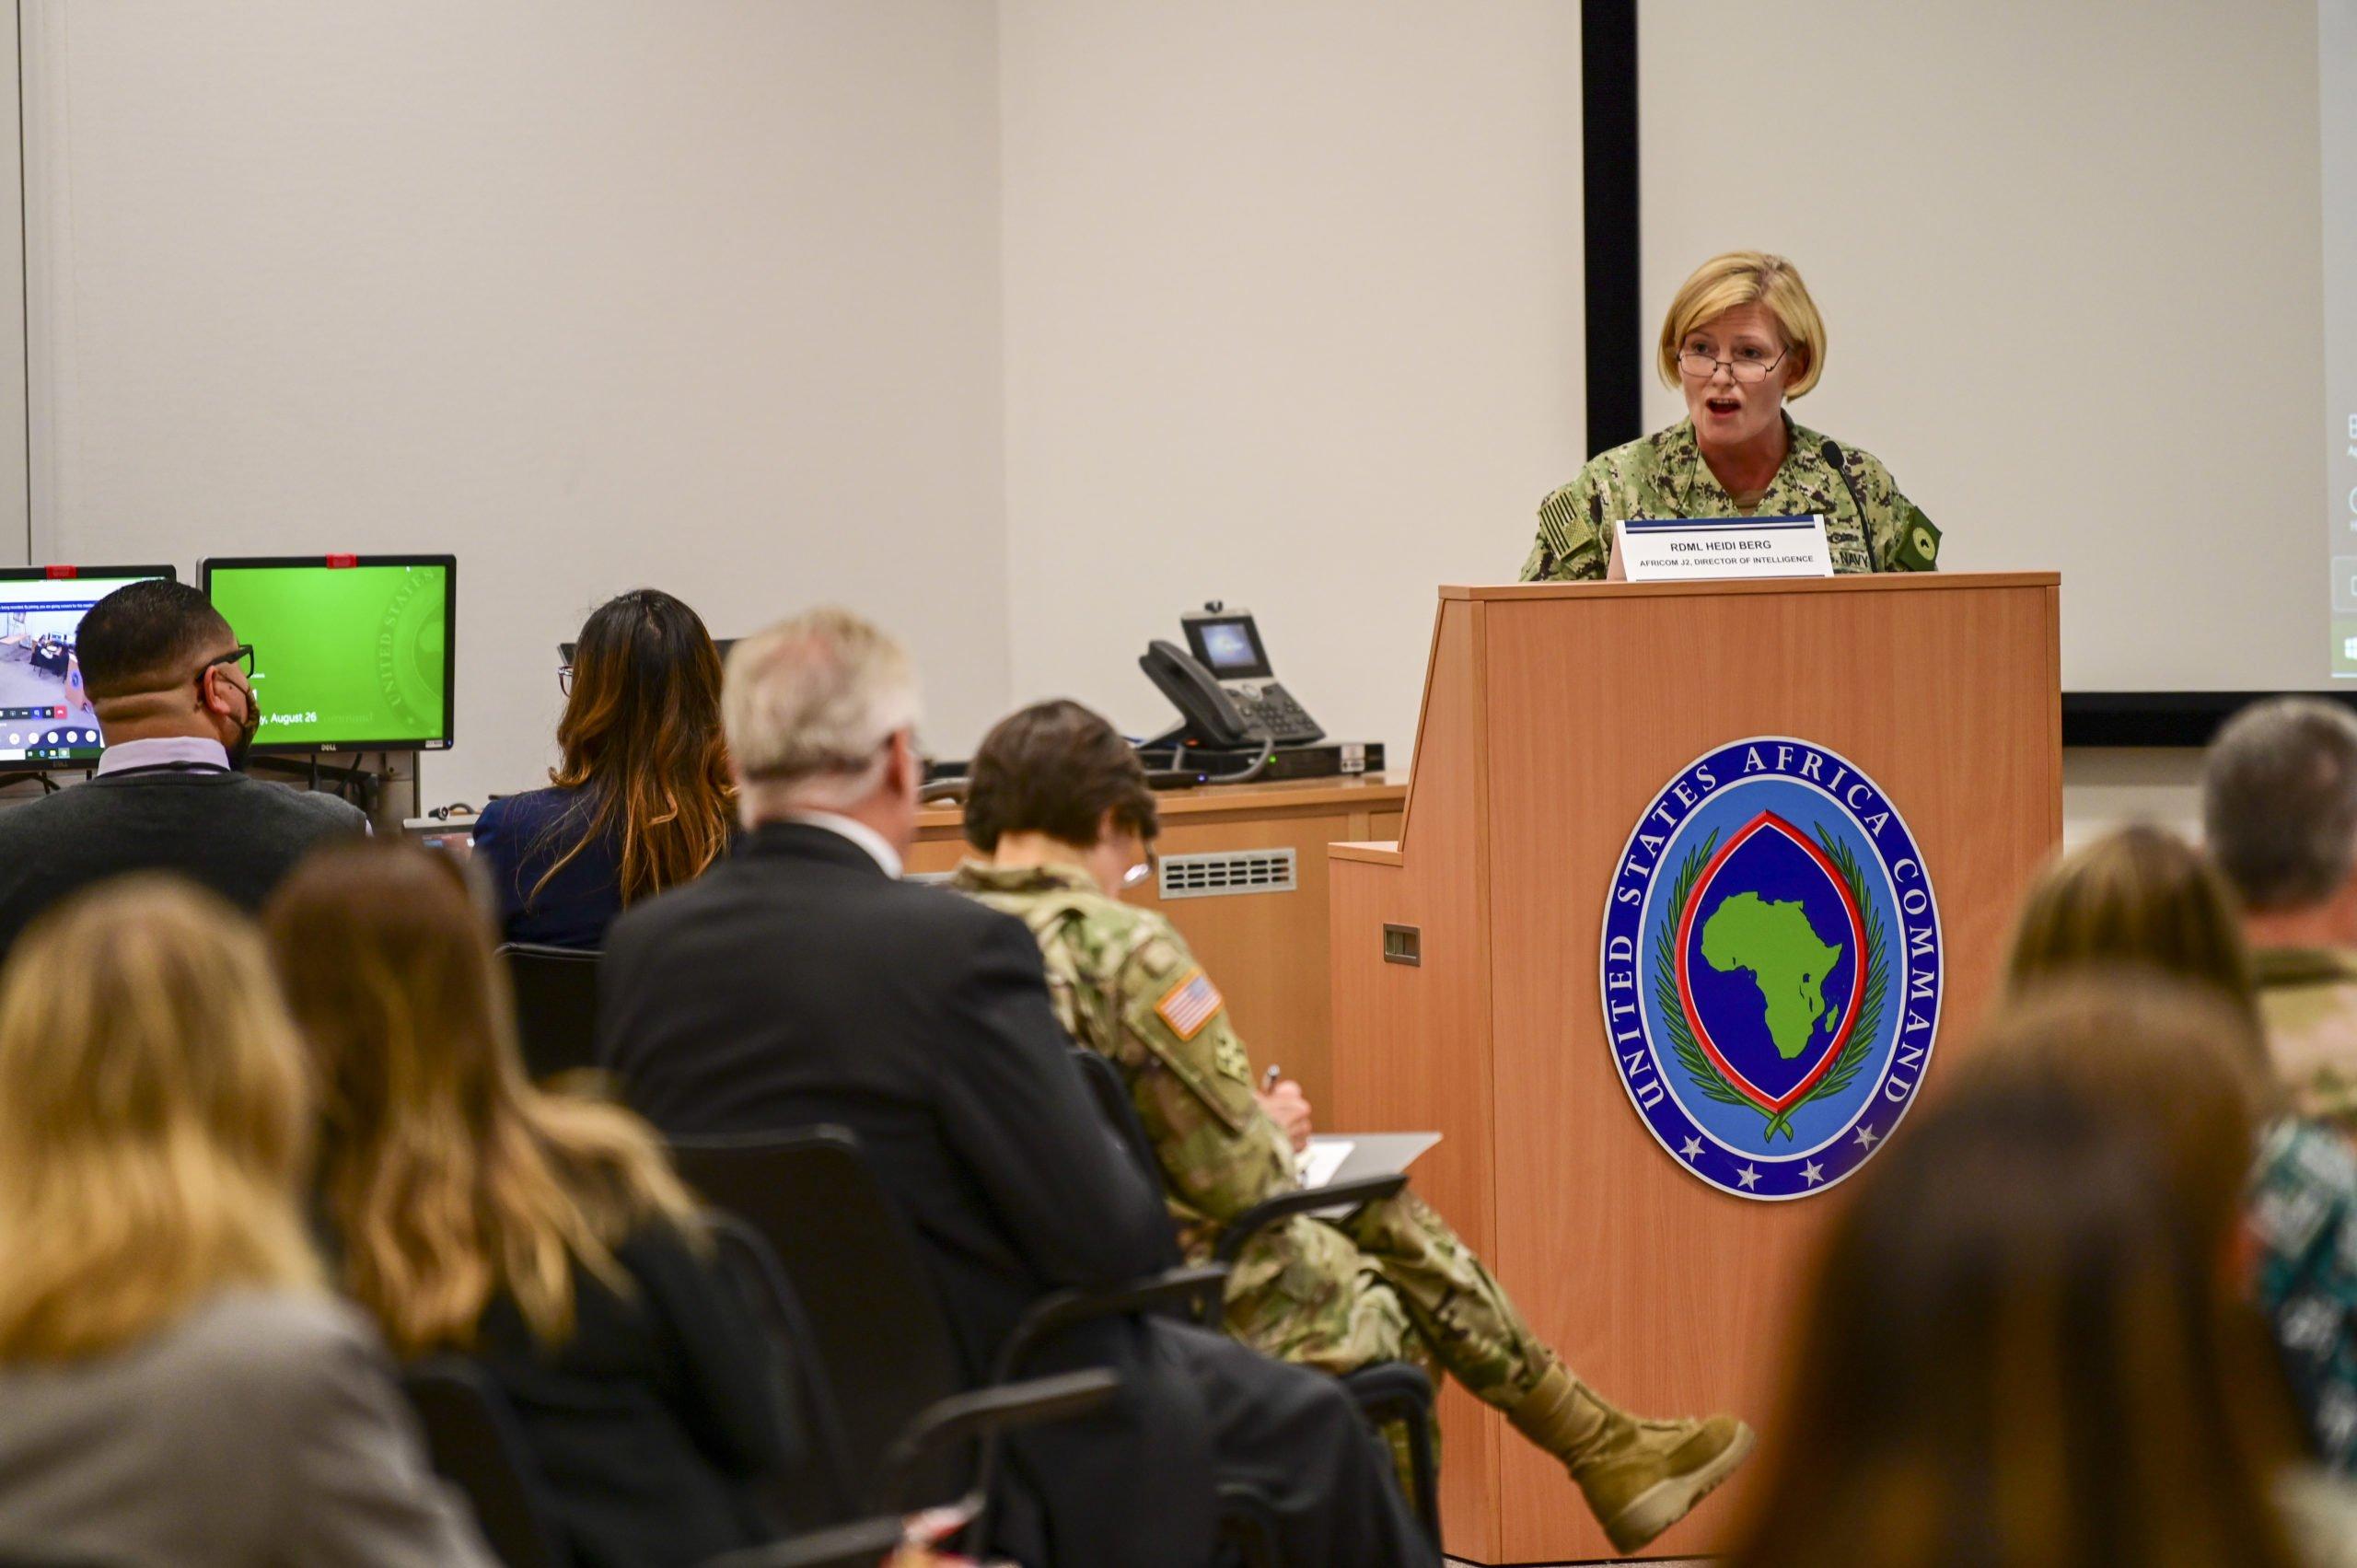 Rear Adm. Heidi Berg, director of intelligence, delivered the keynote address.